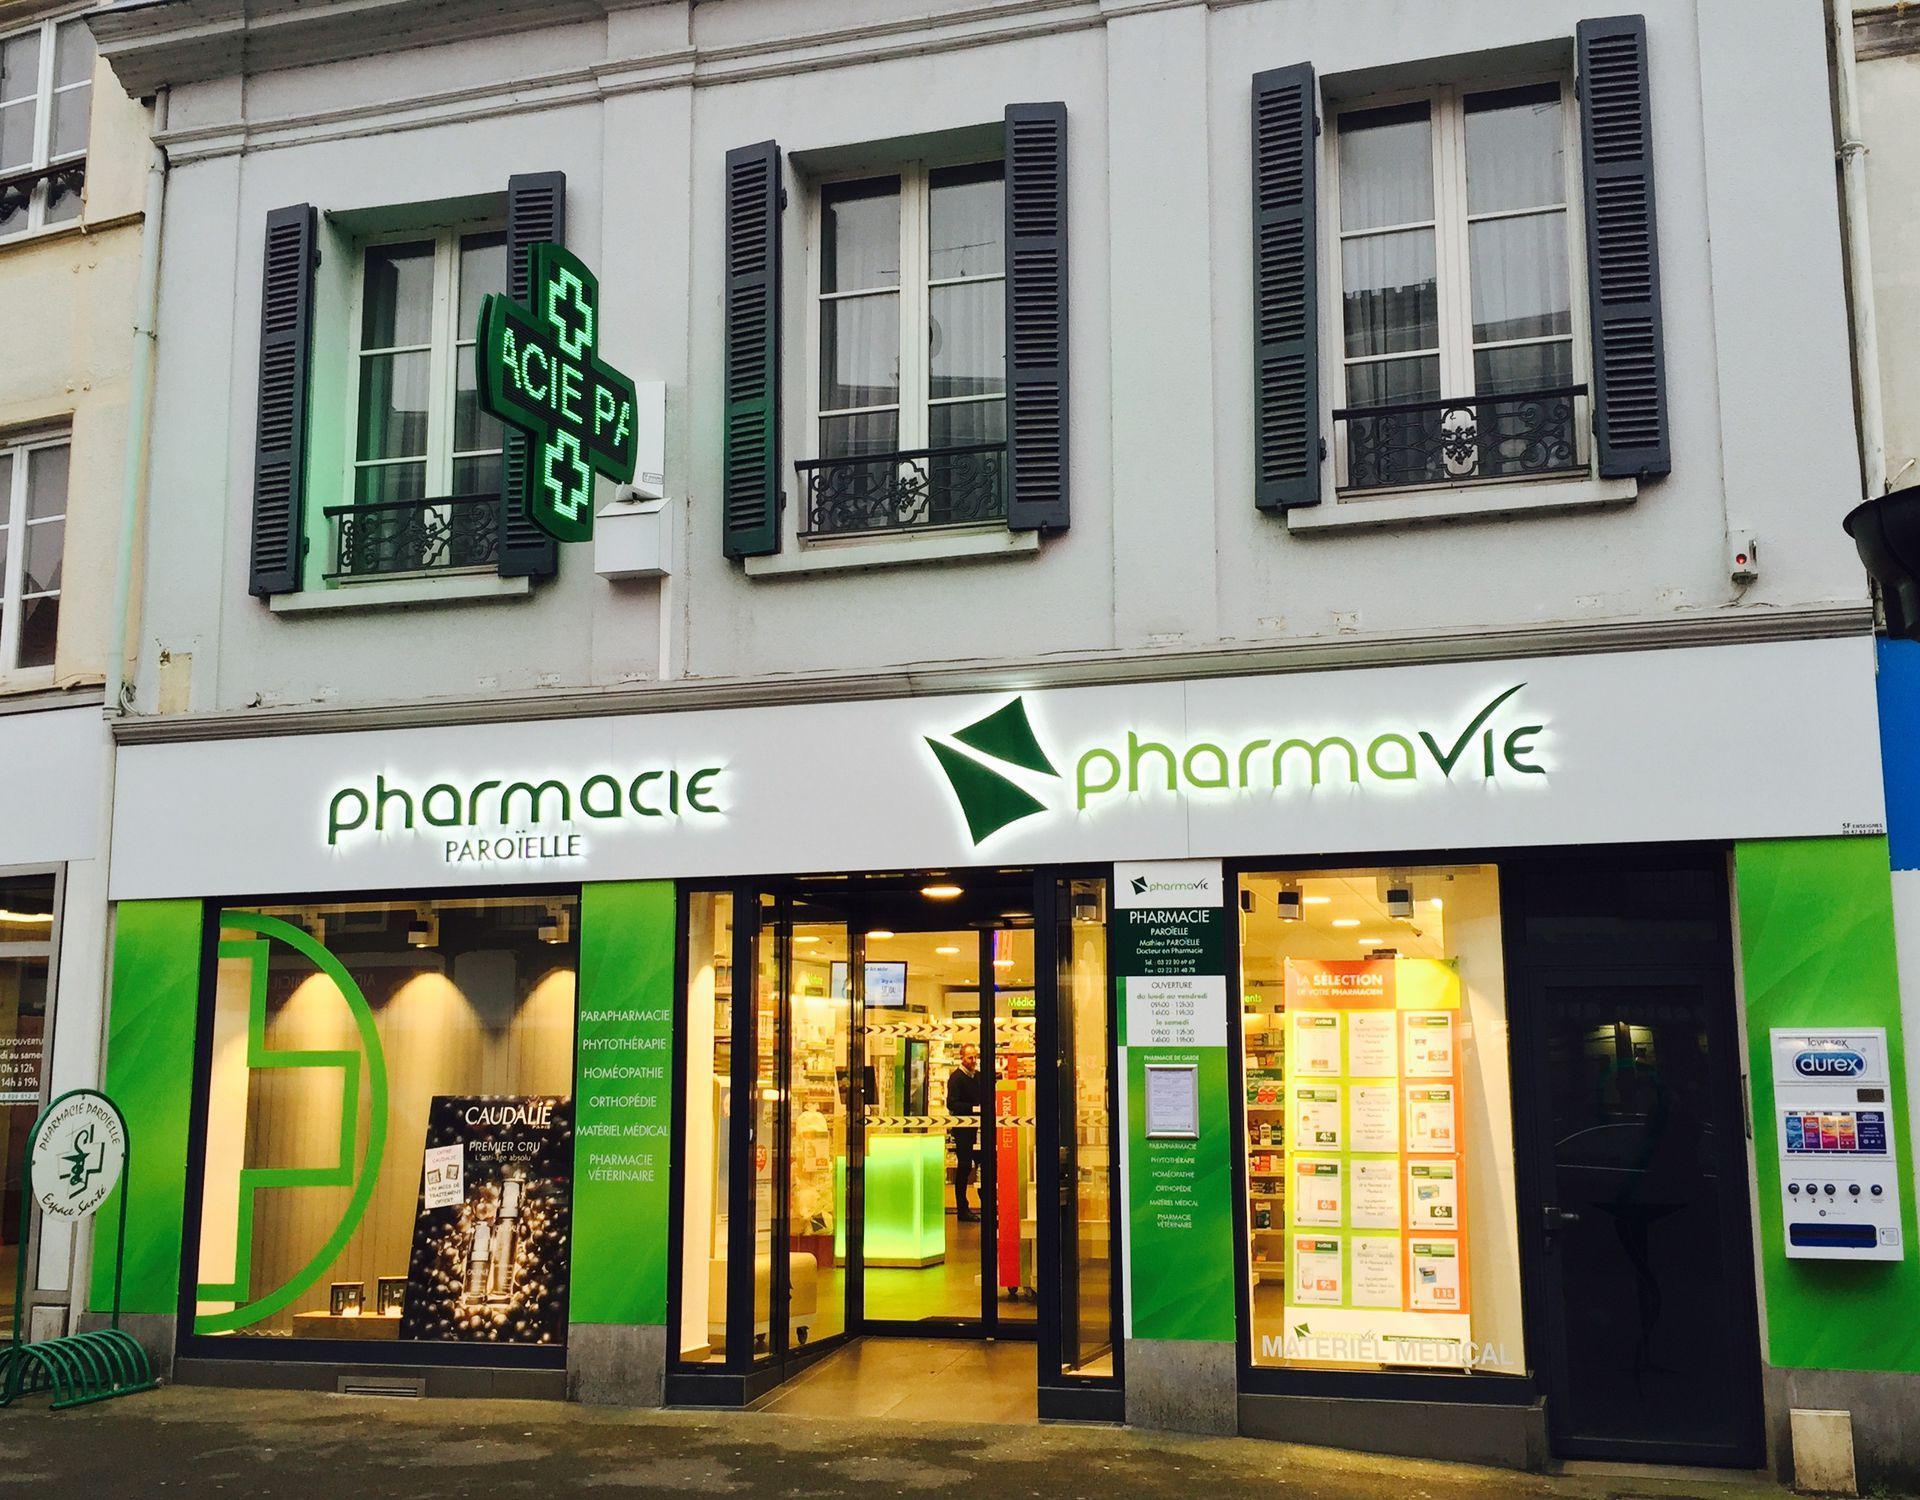 Pharmacie Paroïelle Abbeville